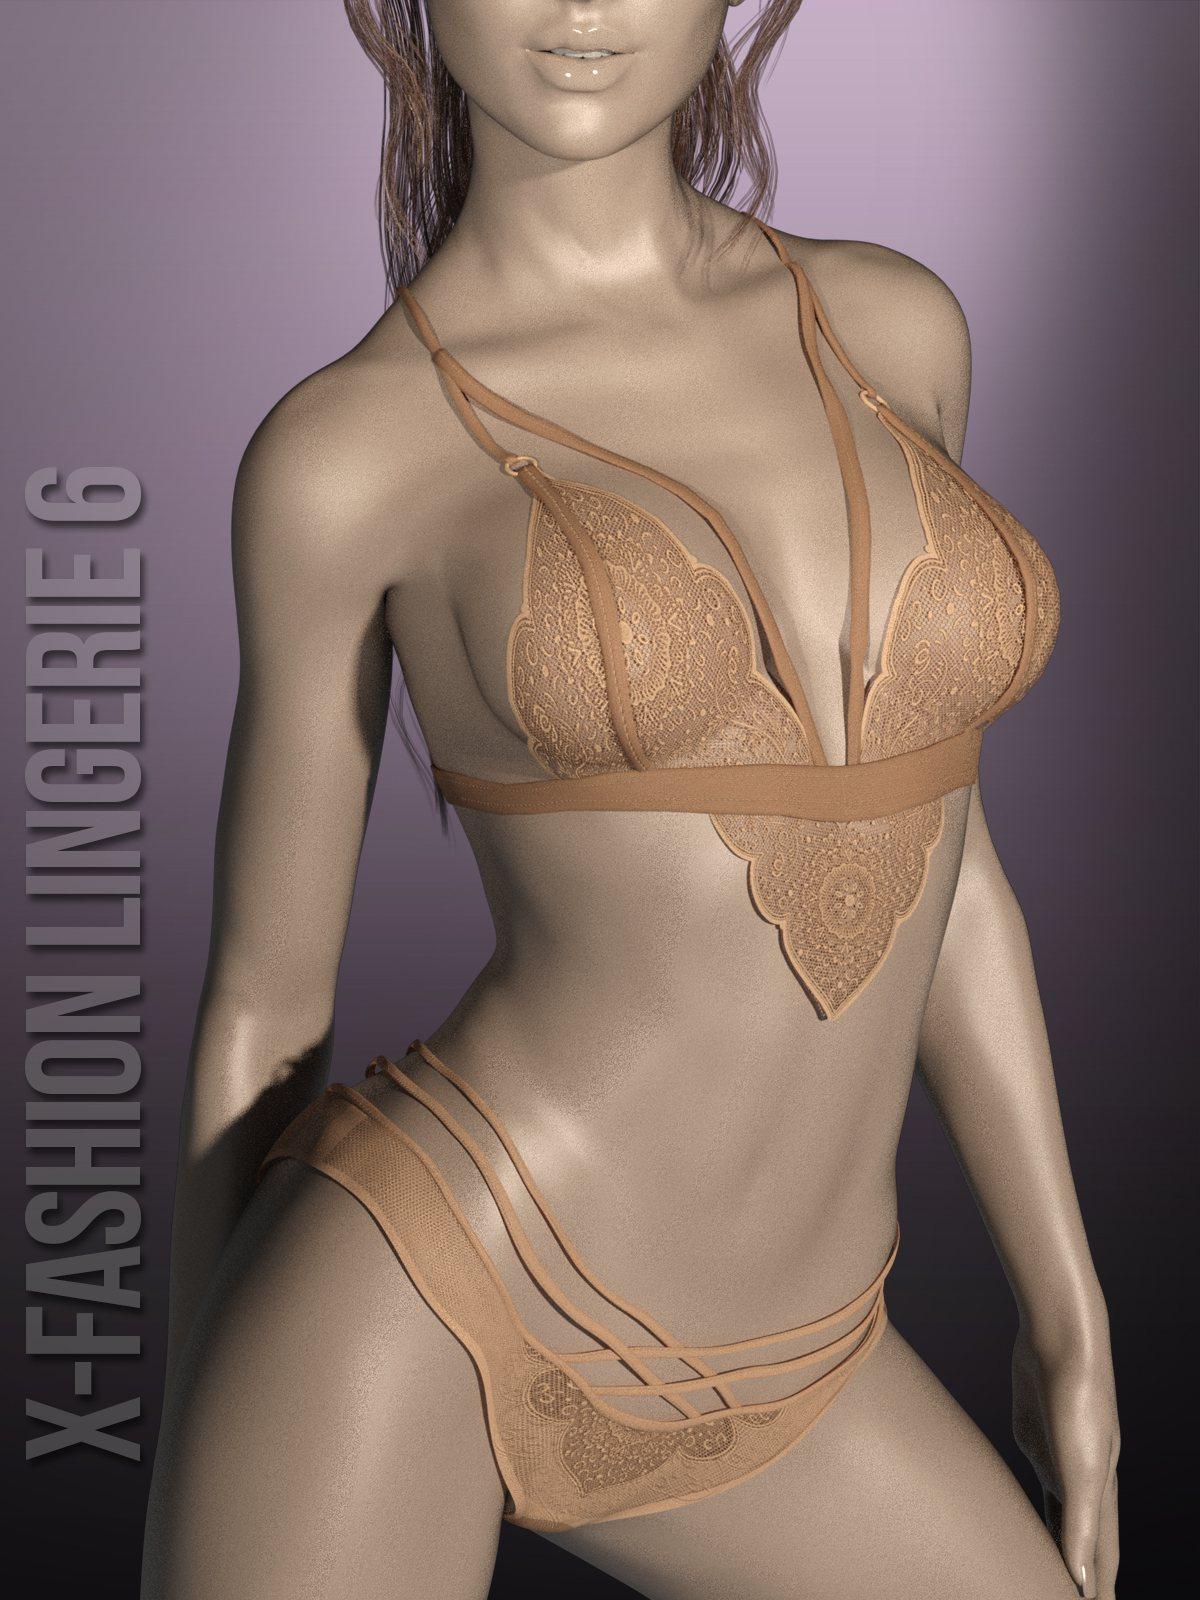 X-Fashion Lingerie6 for G3F_DAZ3D下载站